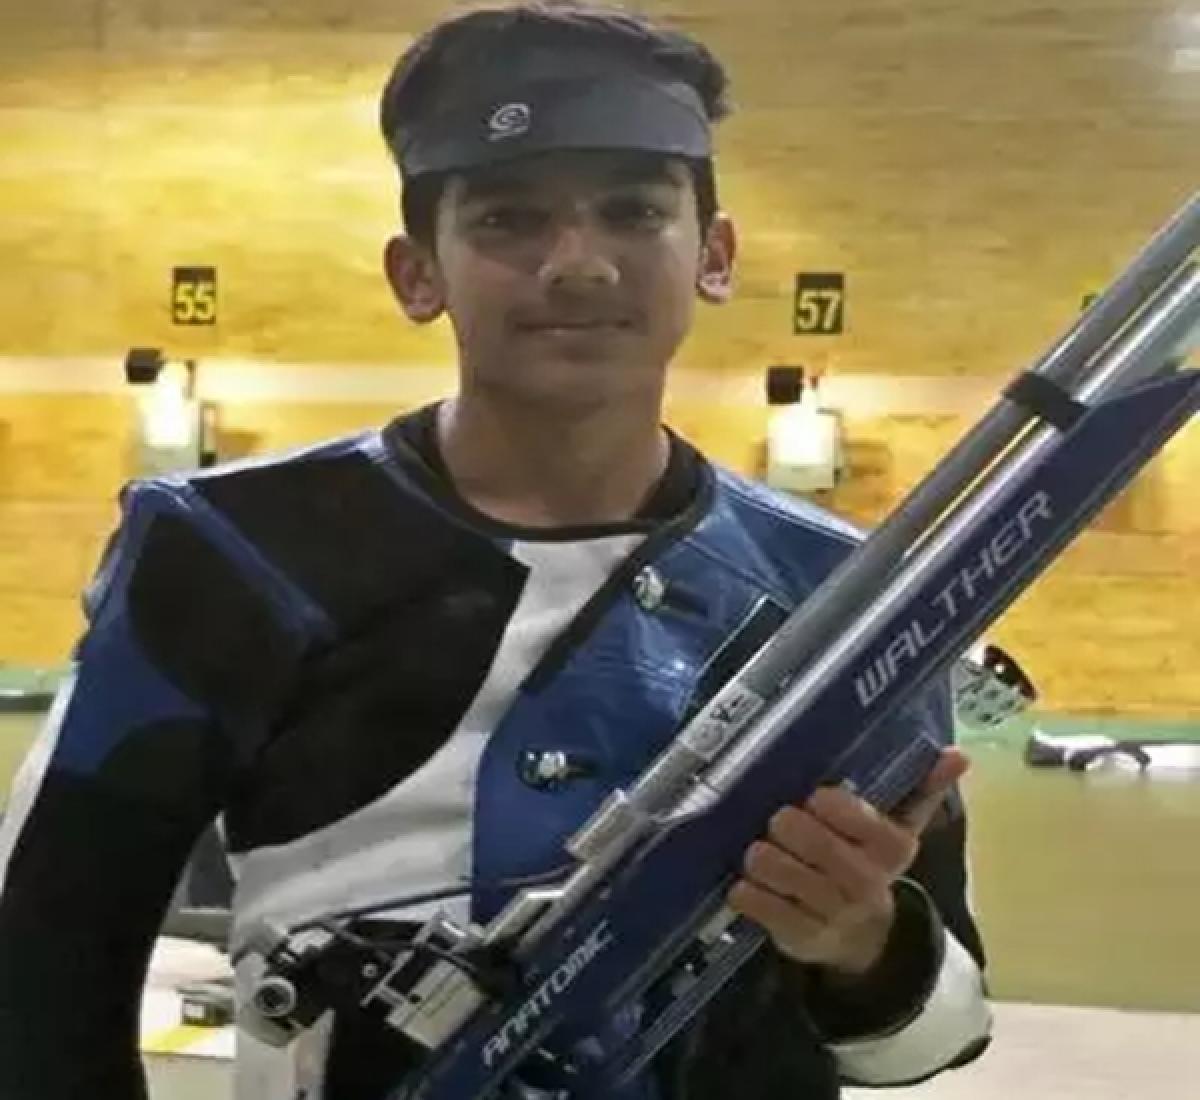 Aishwarya Pratap Singh Tomar clinches 3-position gold to set Jr world record